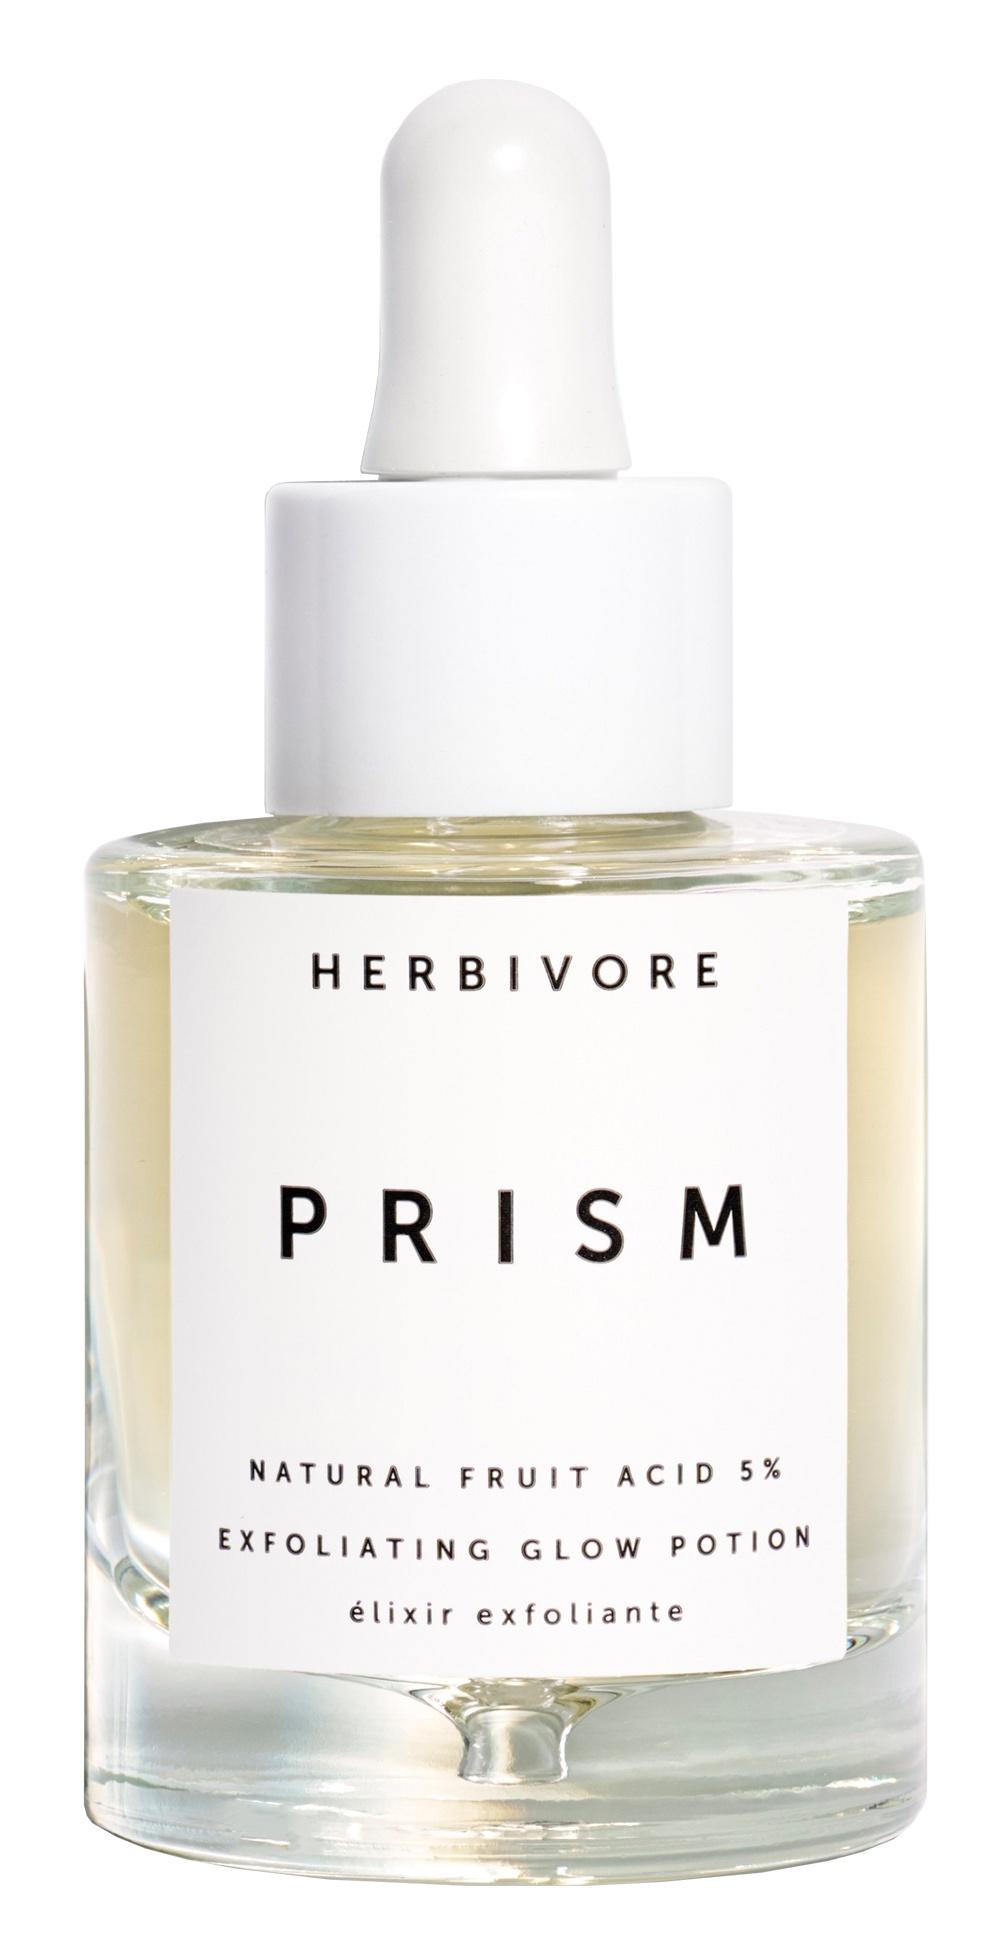 Herbivore Botanicals Prism 5% Exfoliating Glow Potion